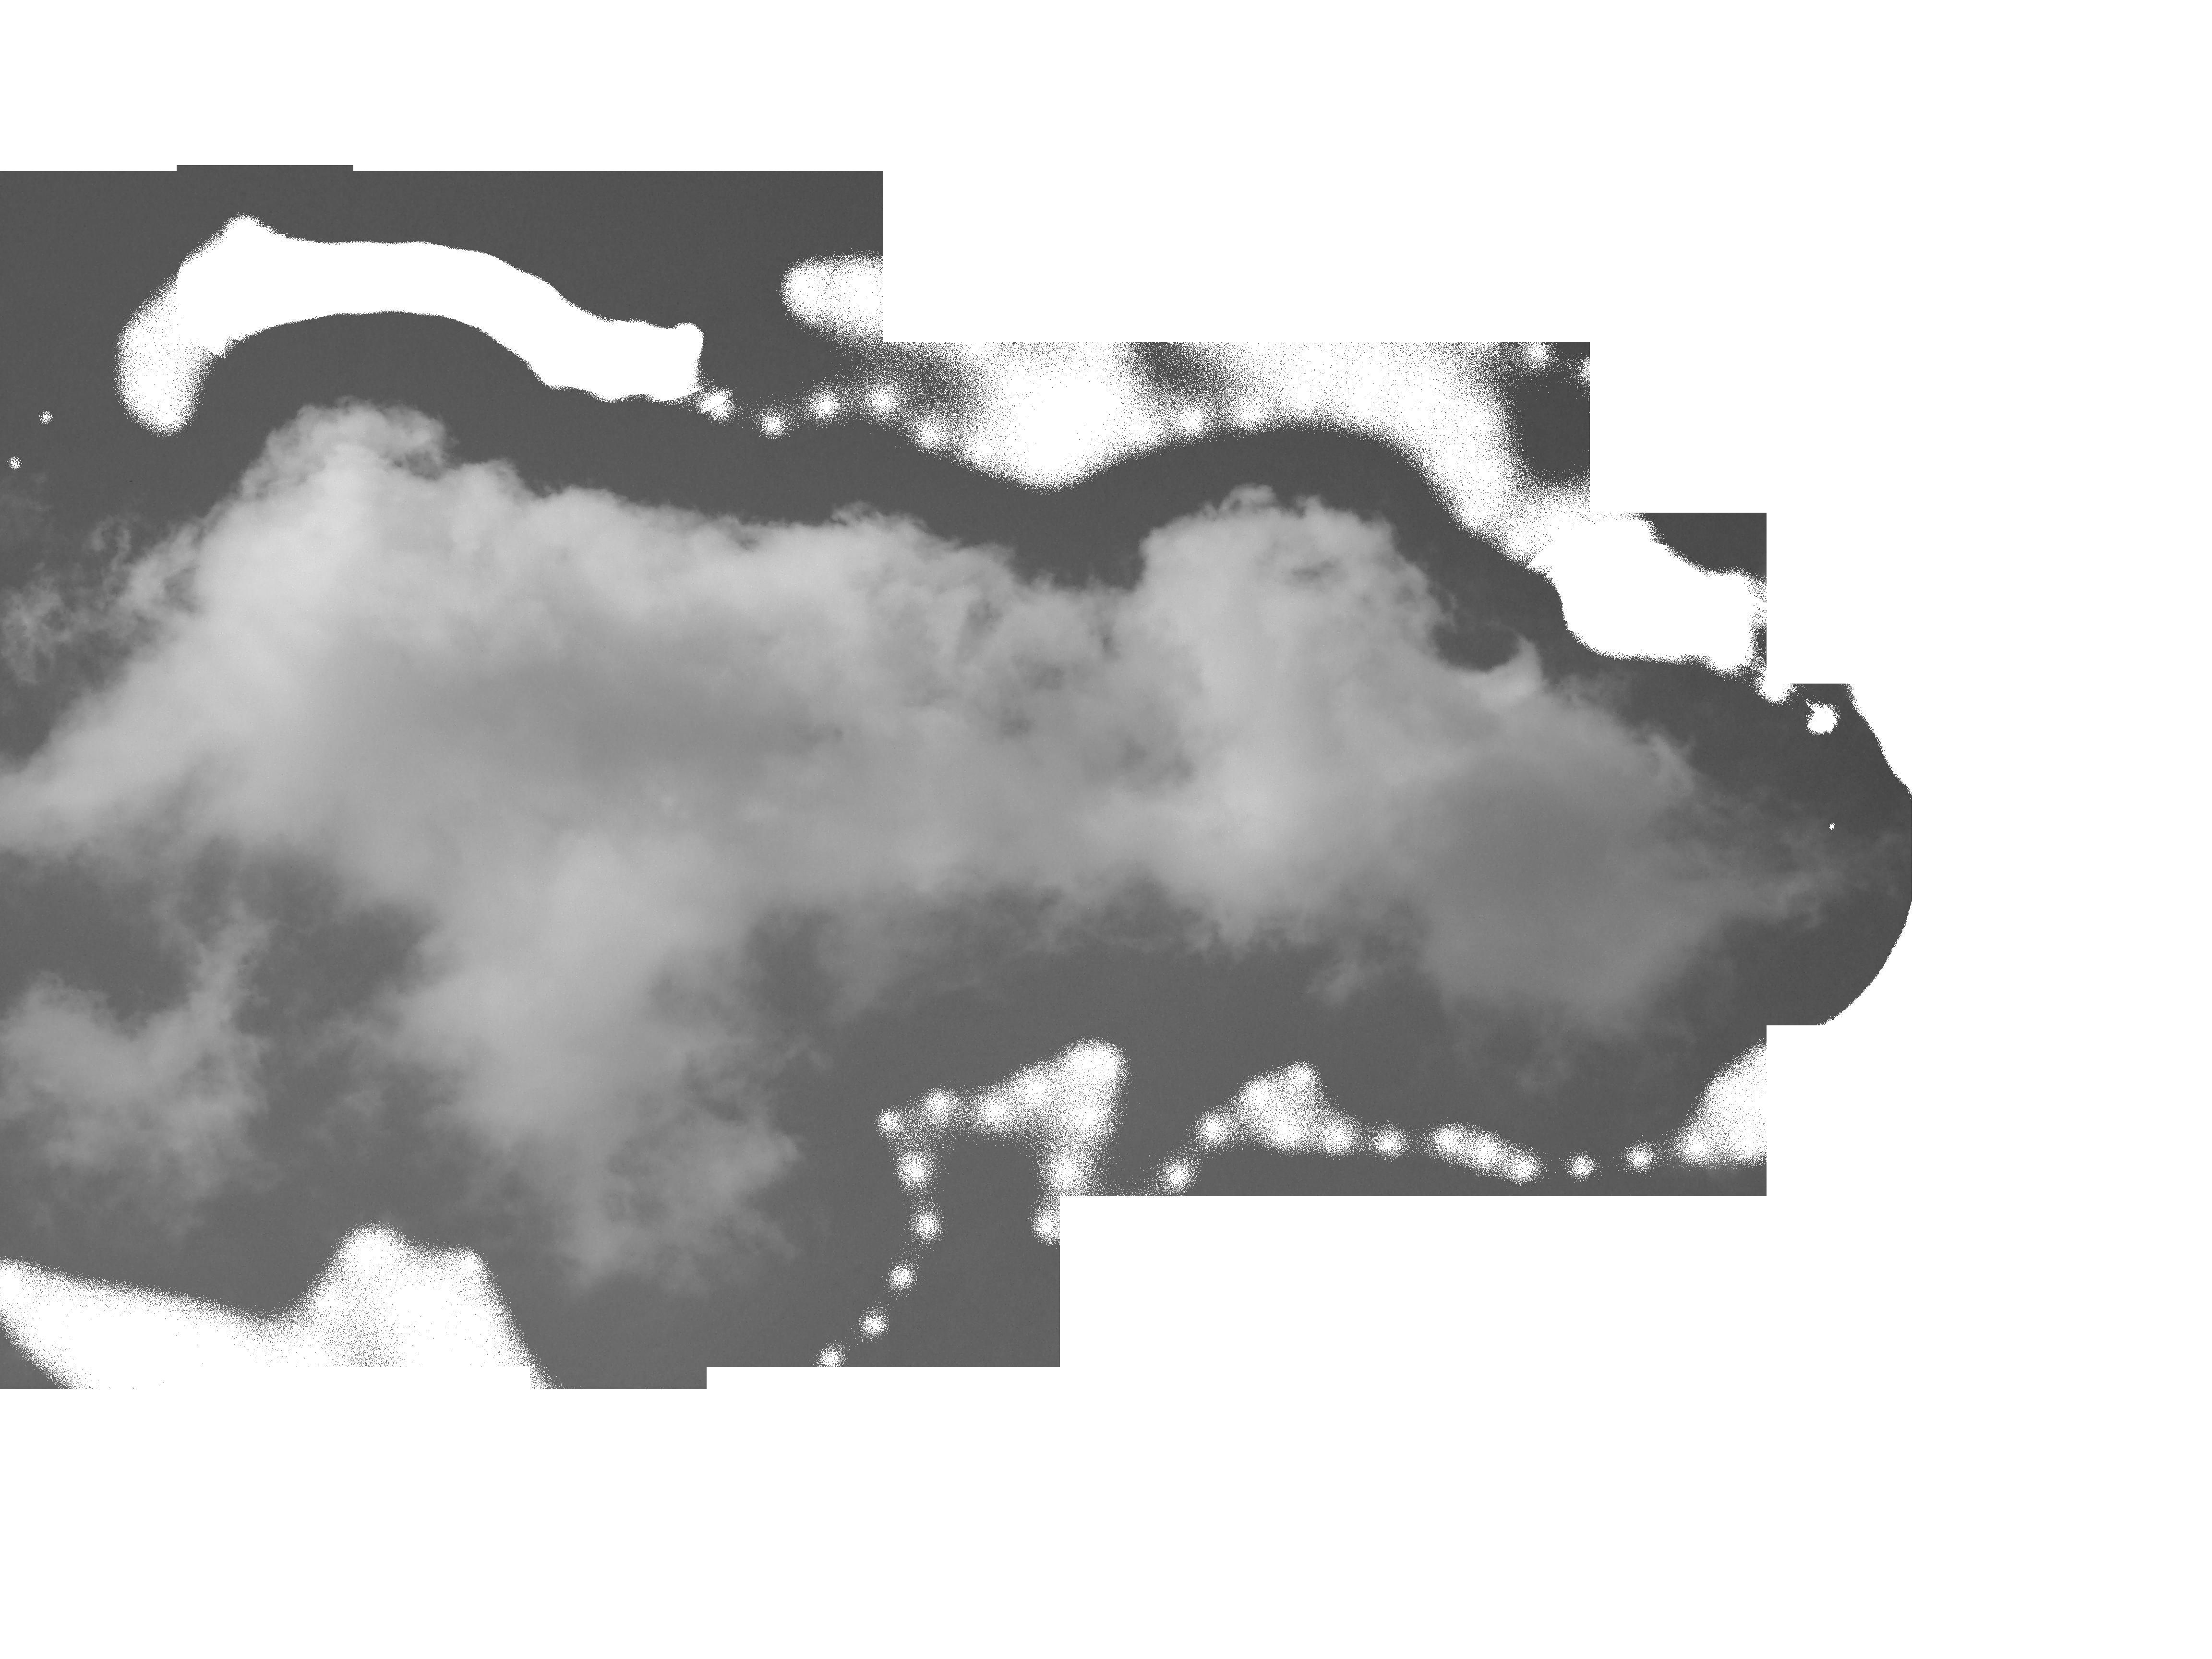 Mist clipart